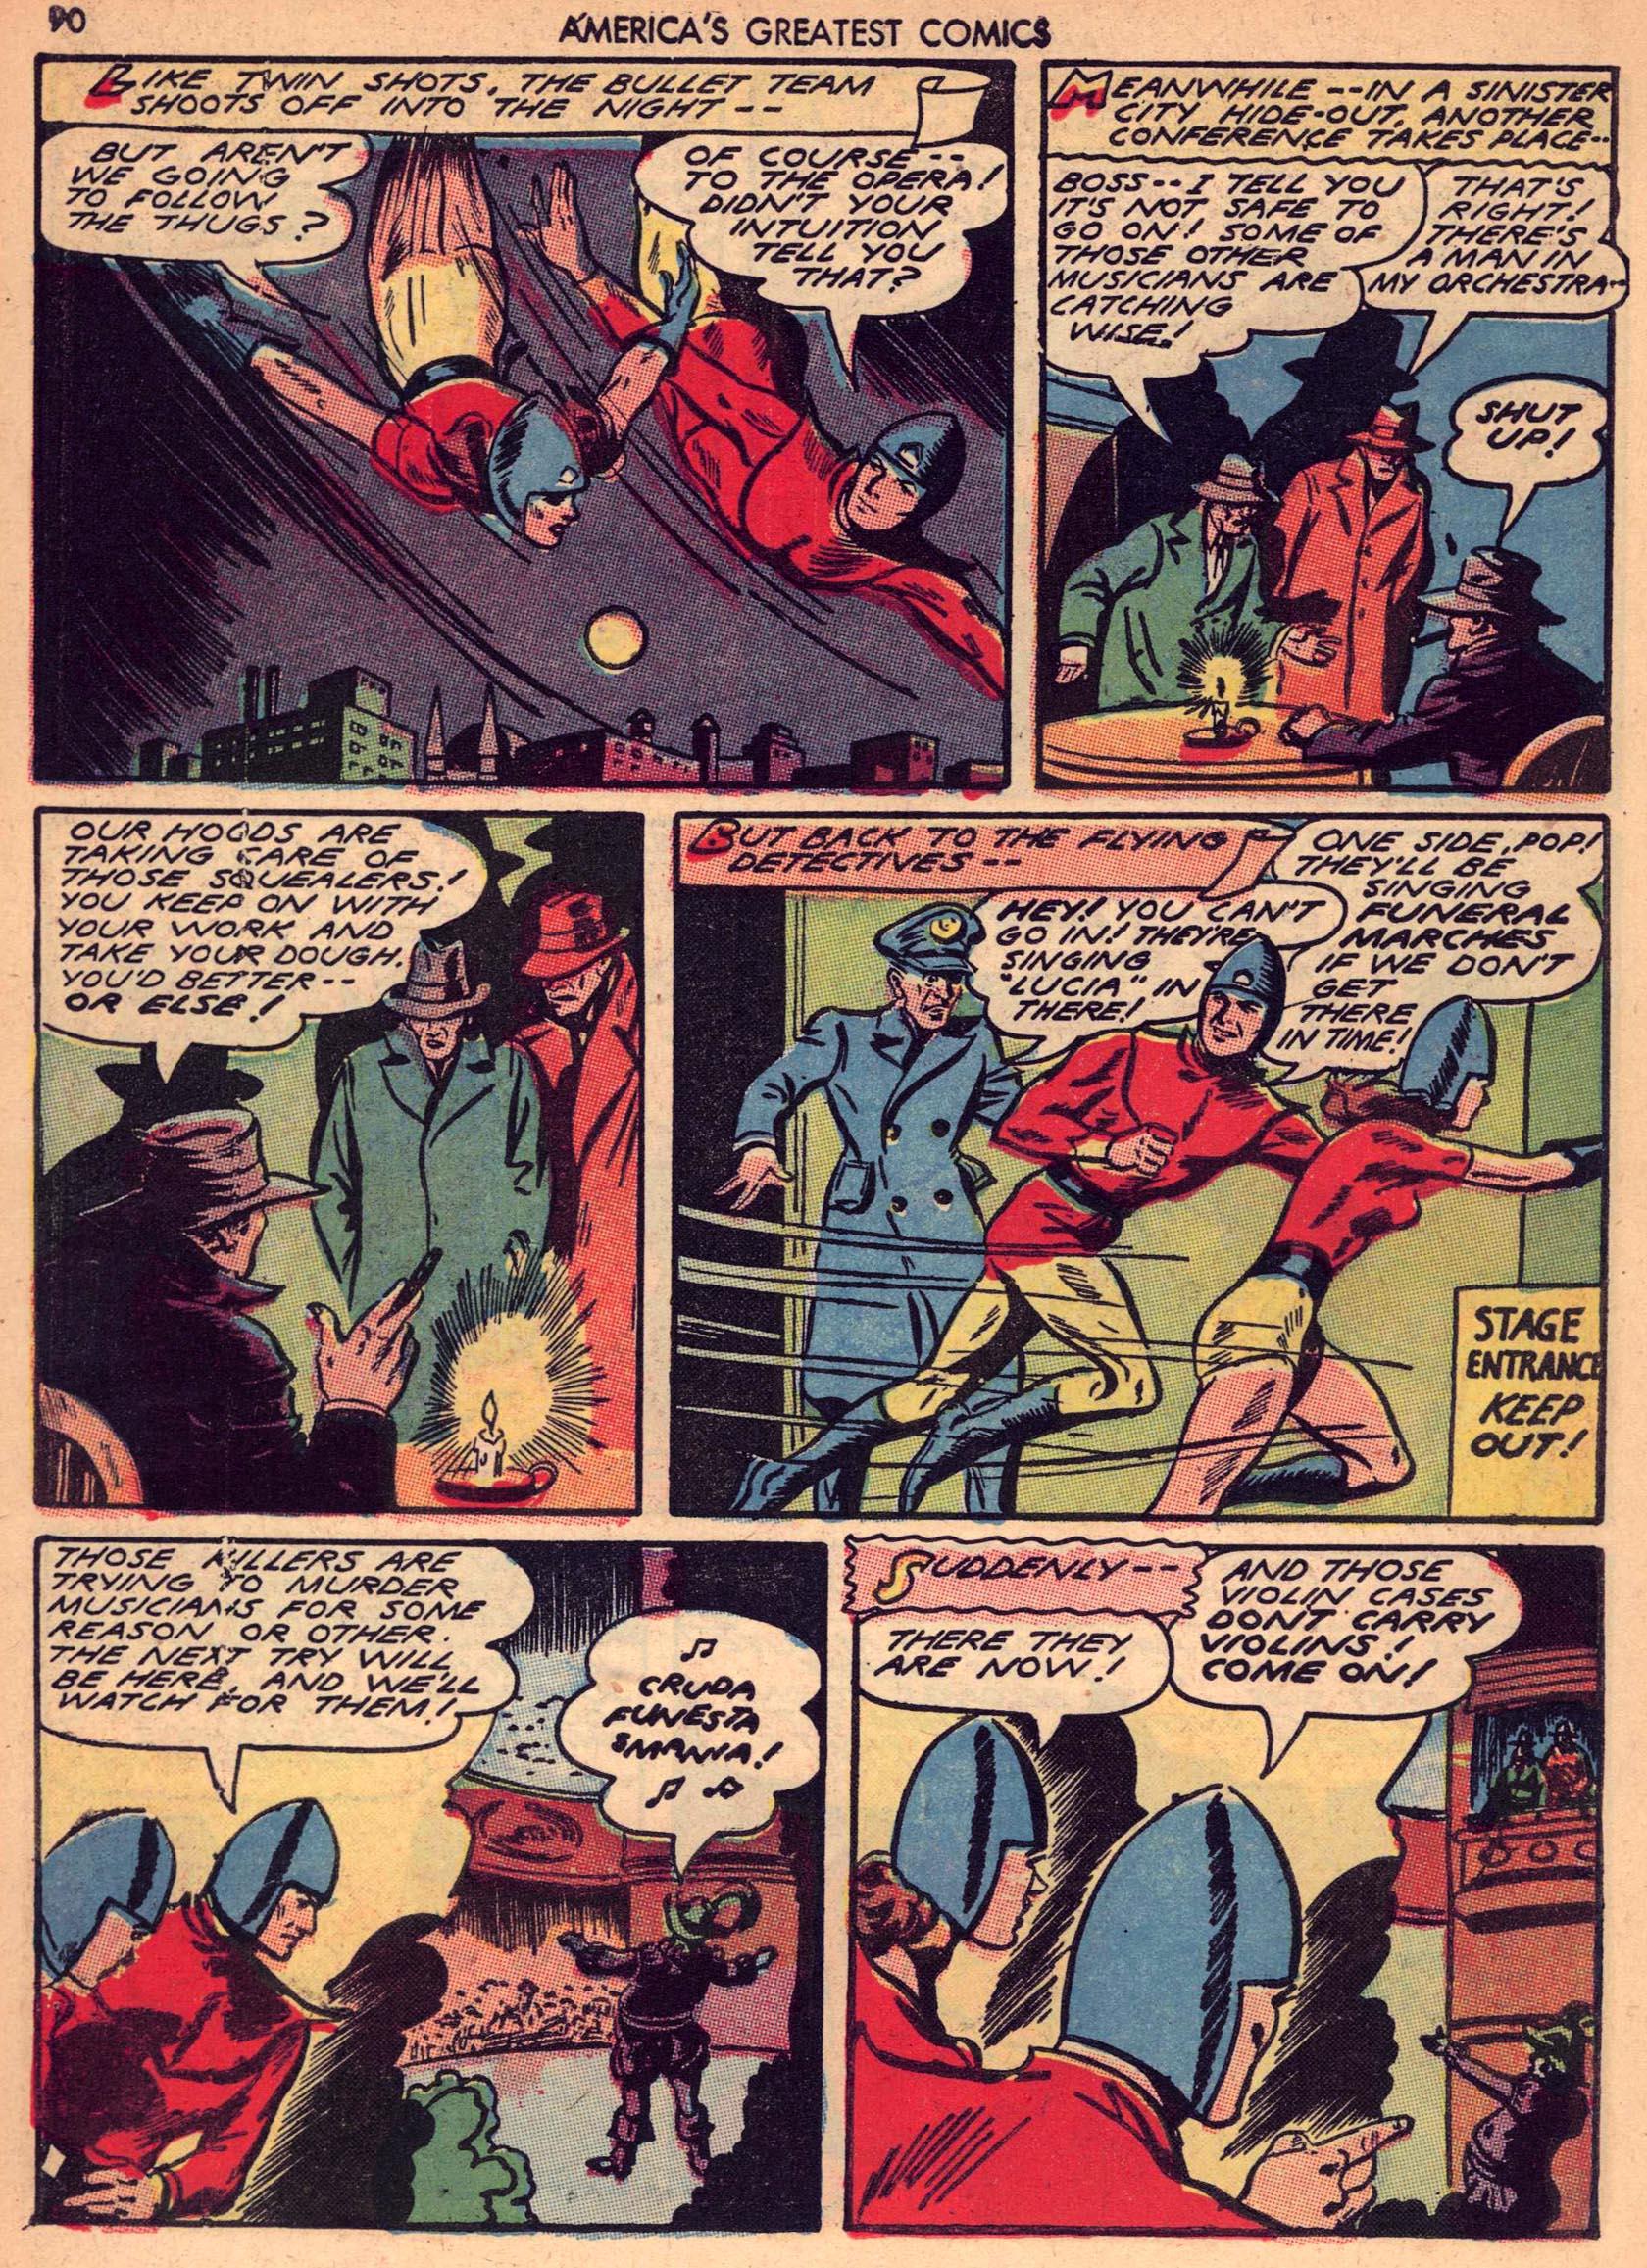 Read online America's Greatest Comics comic -  Issue #7 - 89